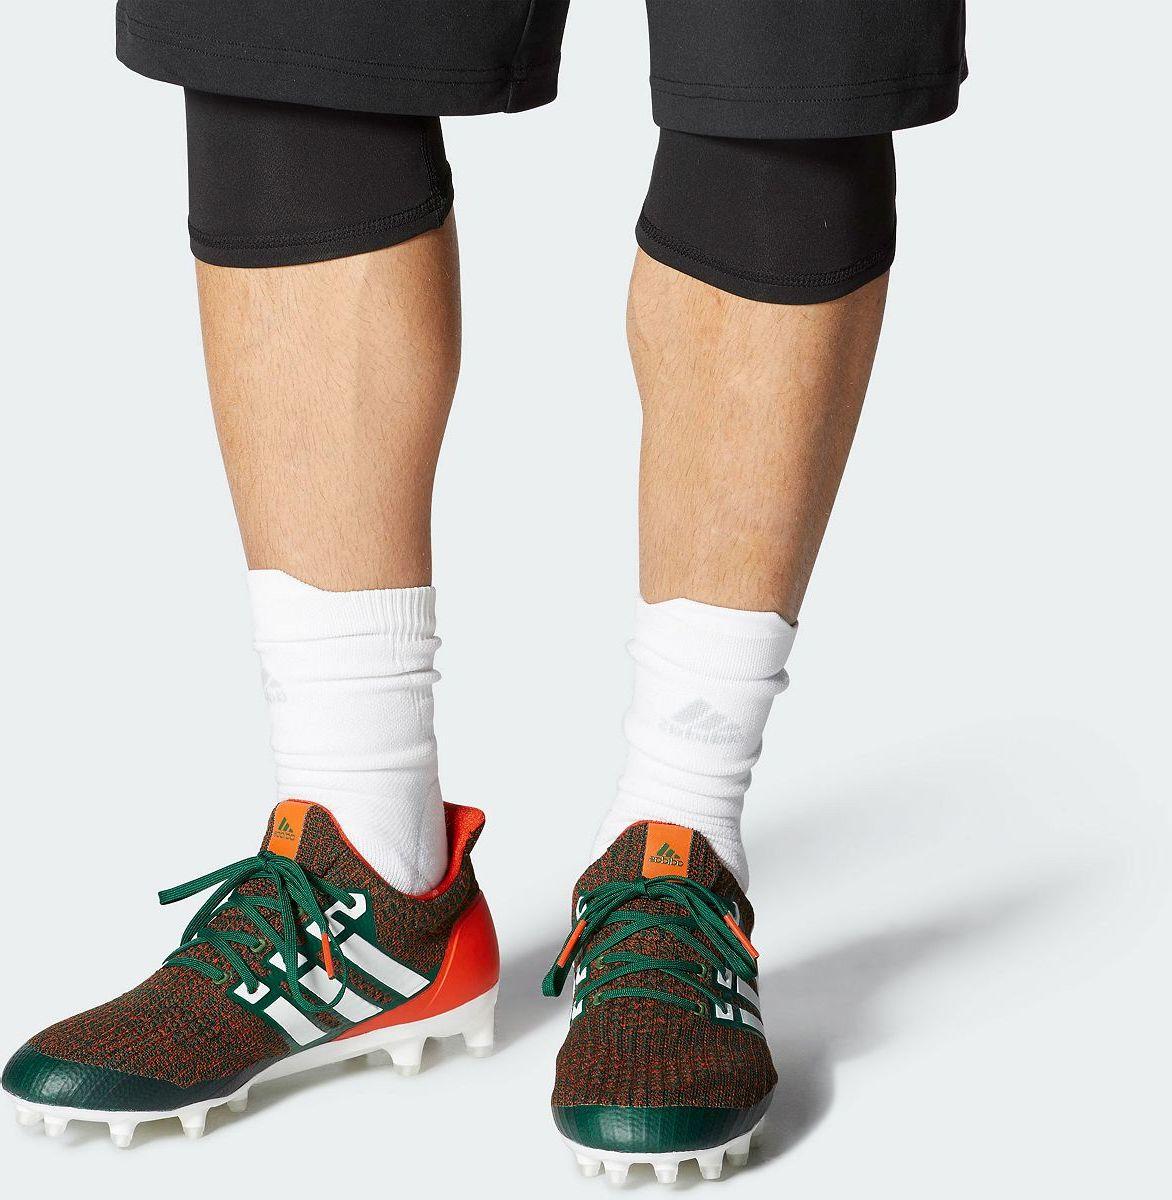 adidas Men's Ultraboost Miami Hurricanes Football Cleats